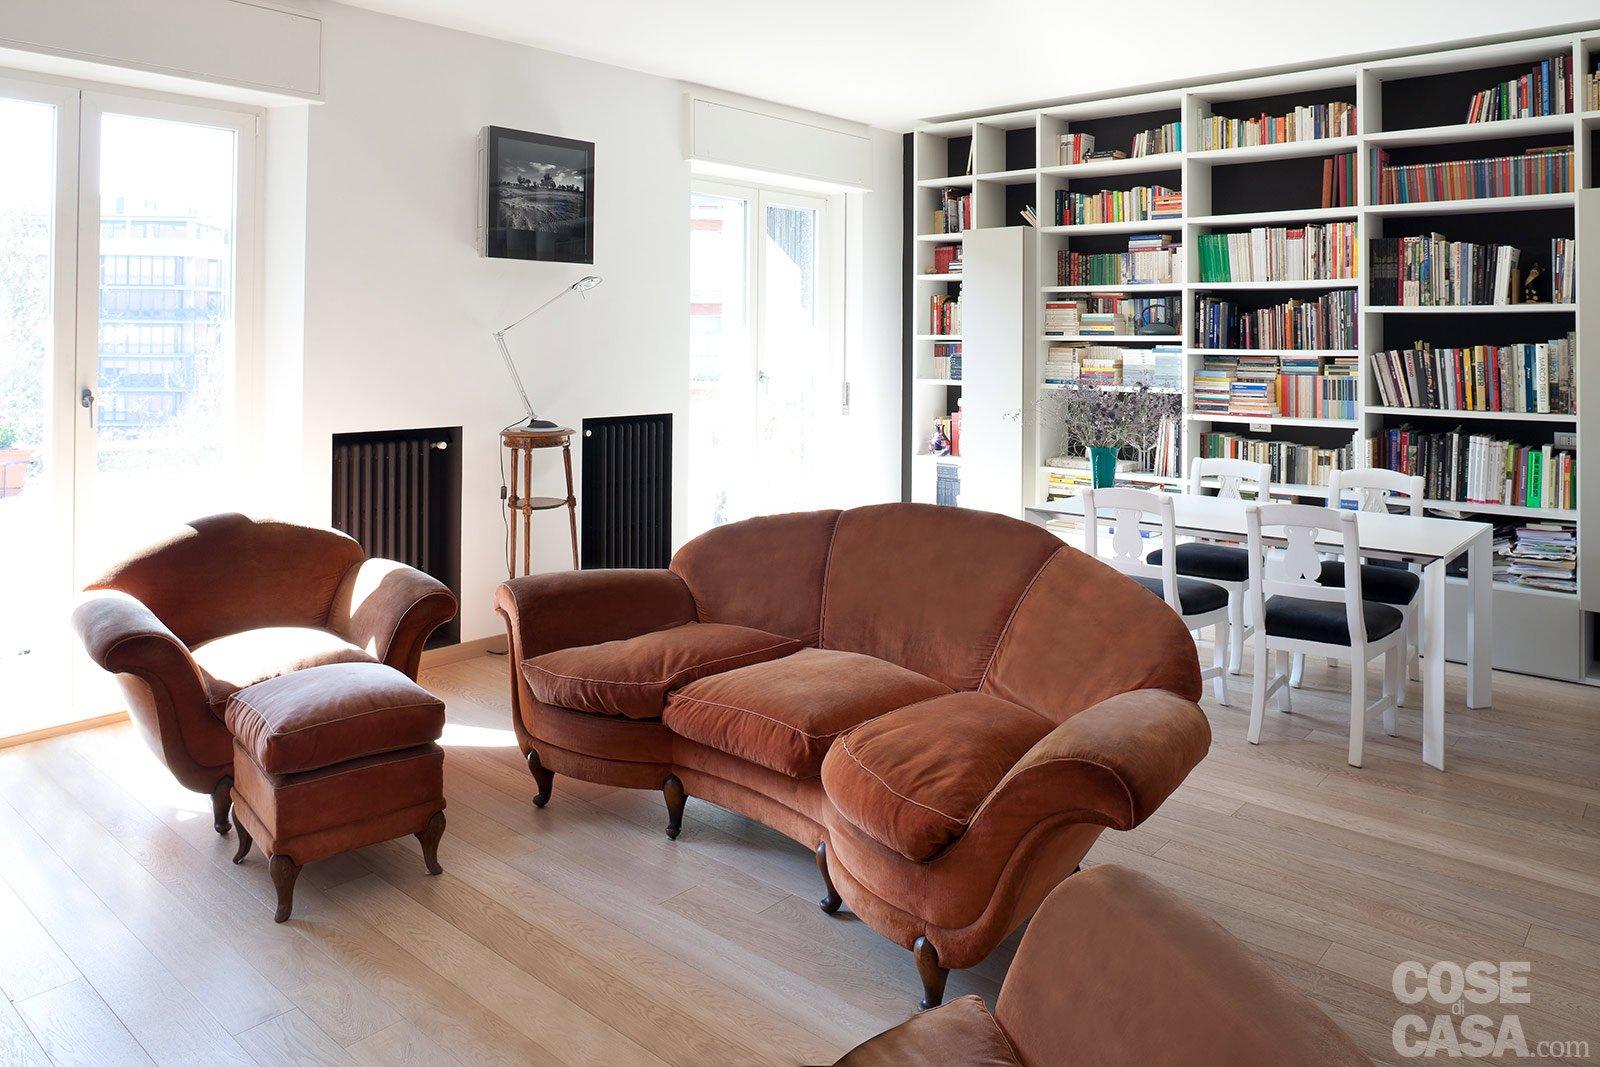 arredamento salotto vintage: colori arredamento: idee per ... - Arredare Salotto Vintage Contemporaneo